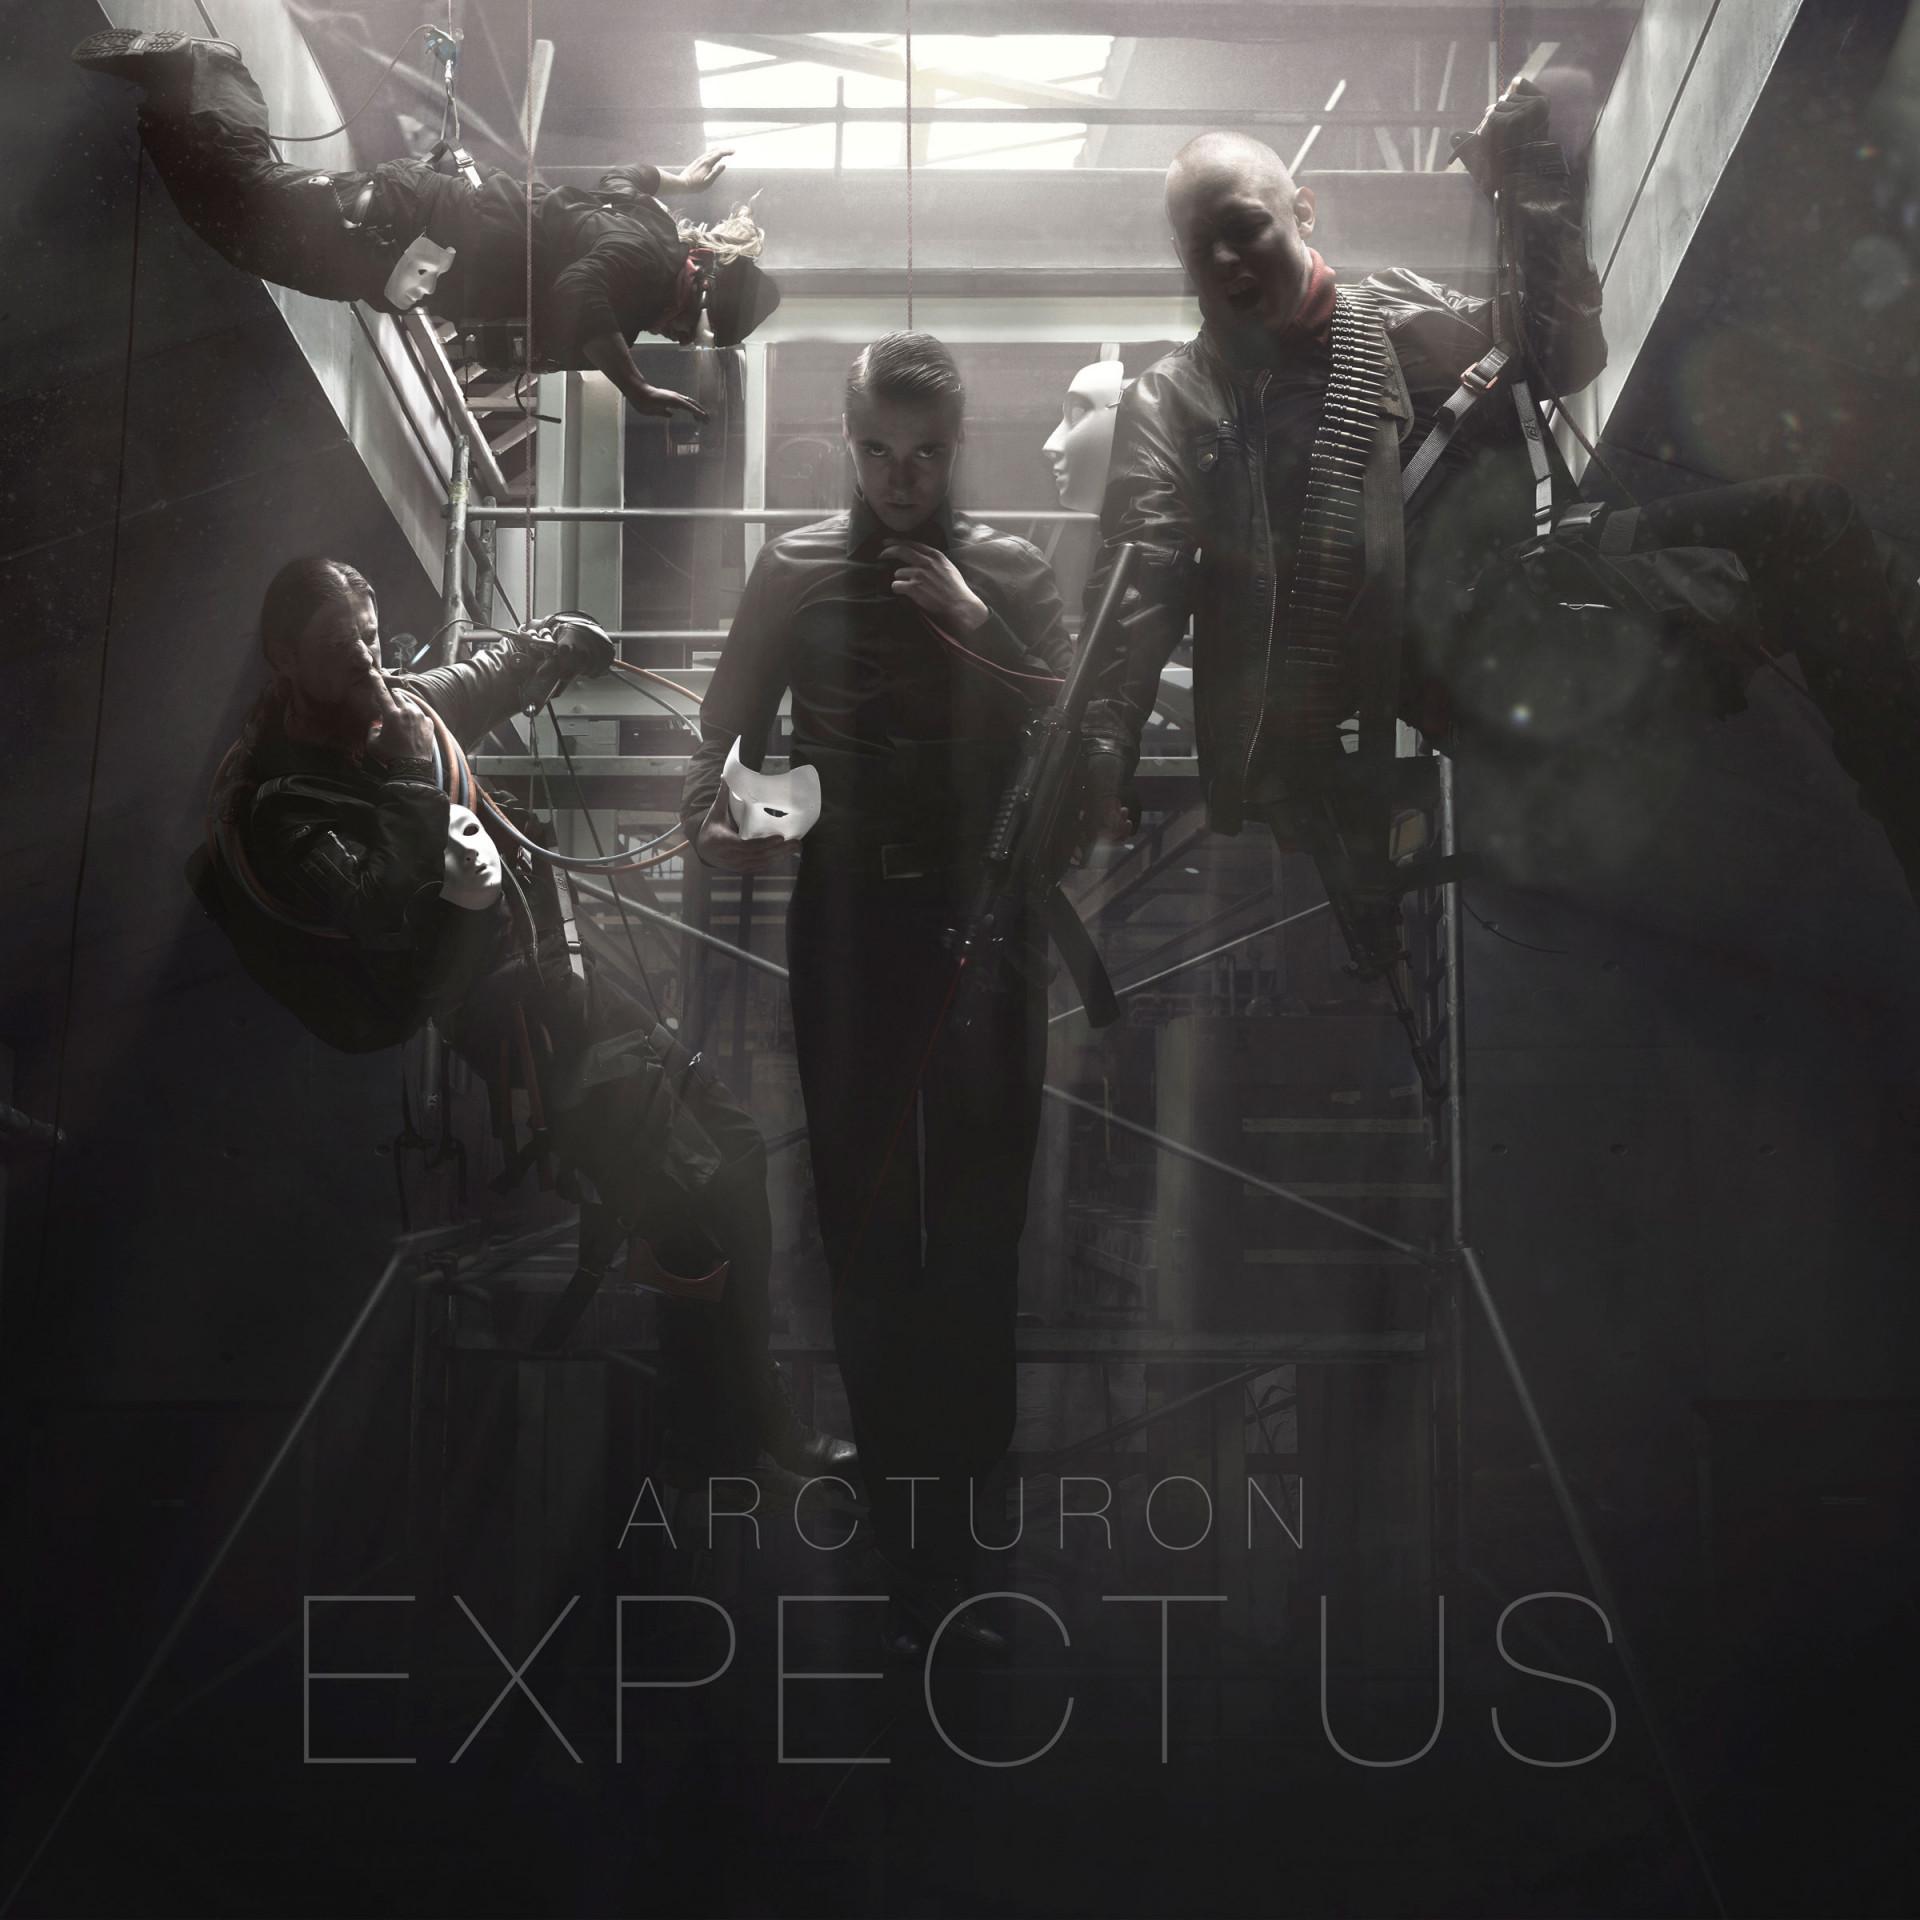 ARCTURON - Expect Us (DIGI)